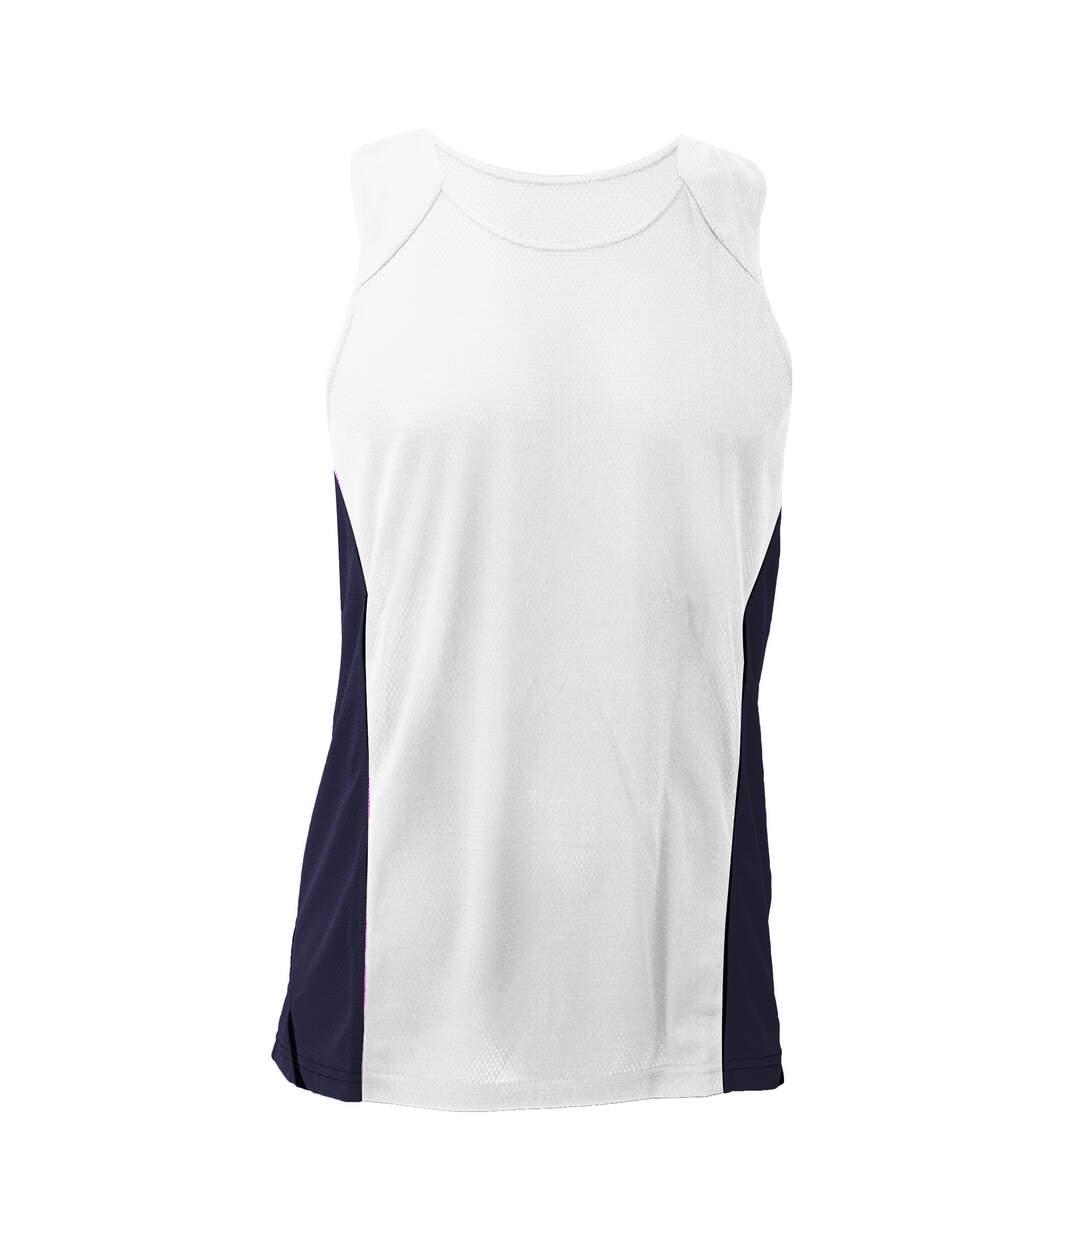 Gamegear® Mens Cooltex® Sports Sleevless Vest Top / Mens Sportswear (White/Navy) - UTBC433